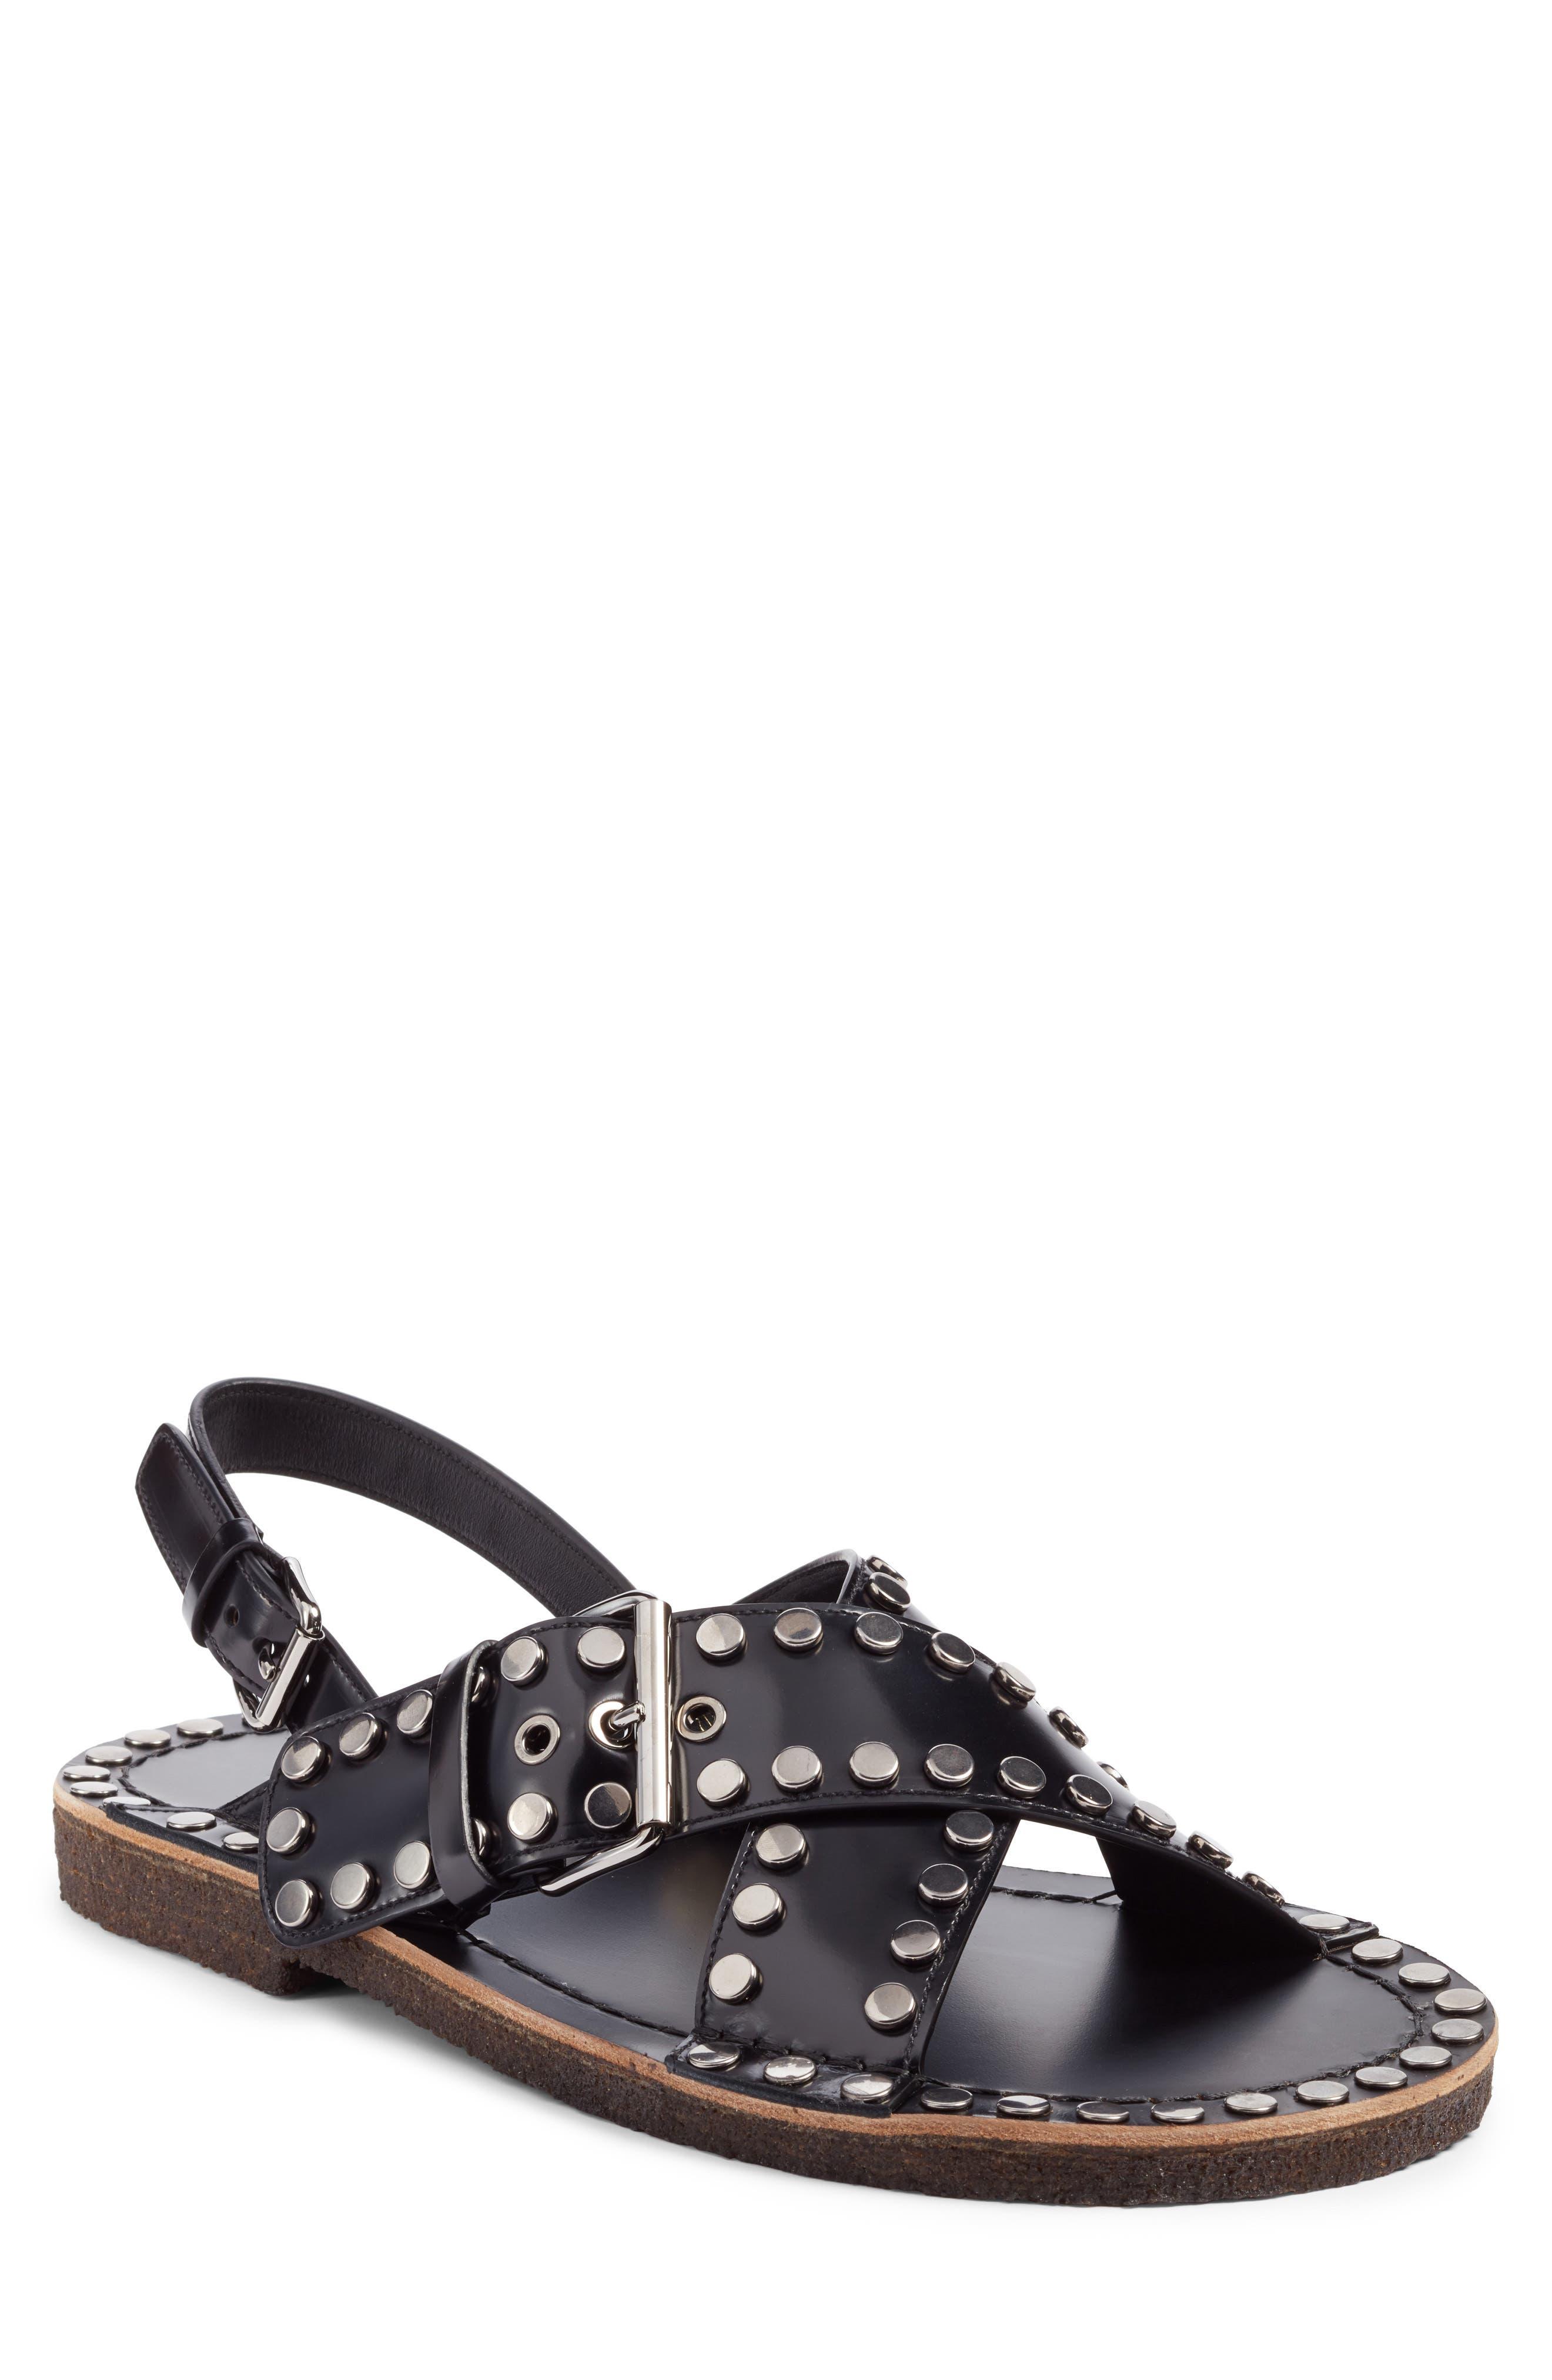 Alternate Image 1 Selected - Prada Crisscross Sandal (Men)